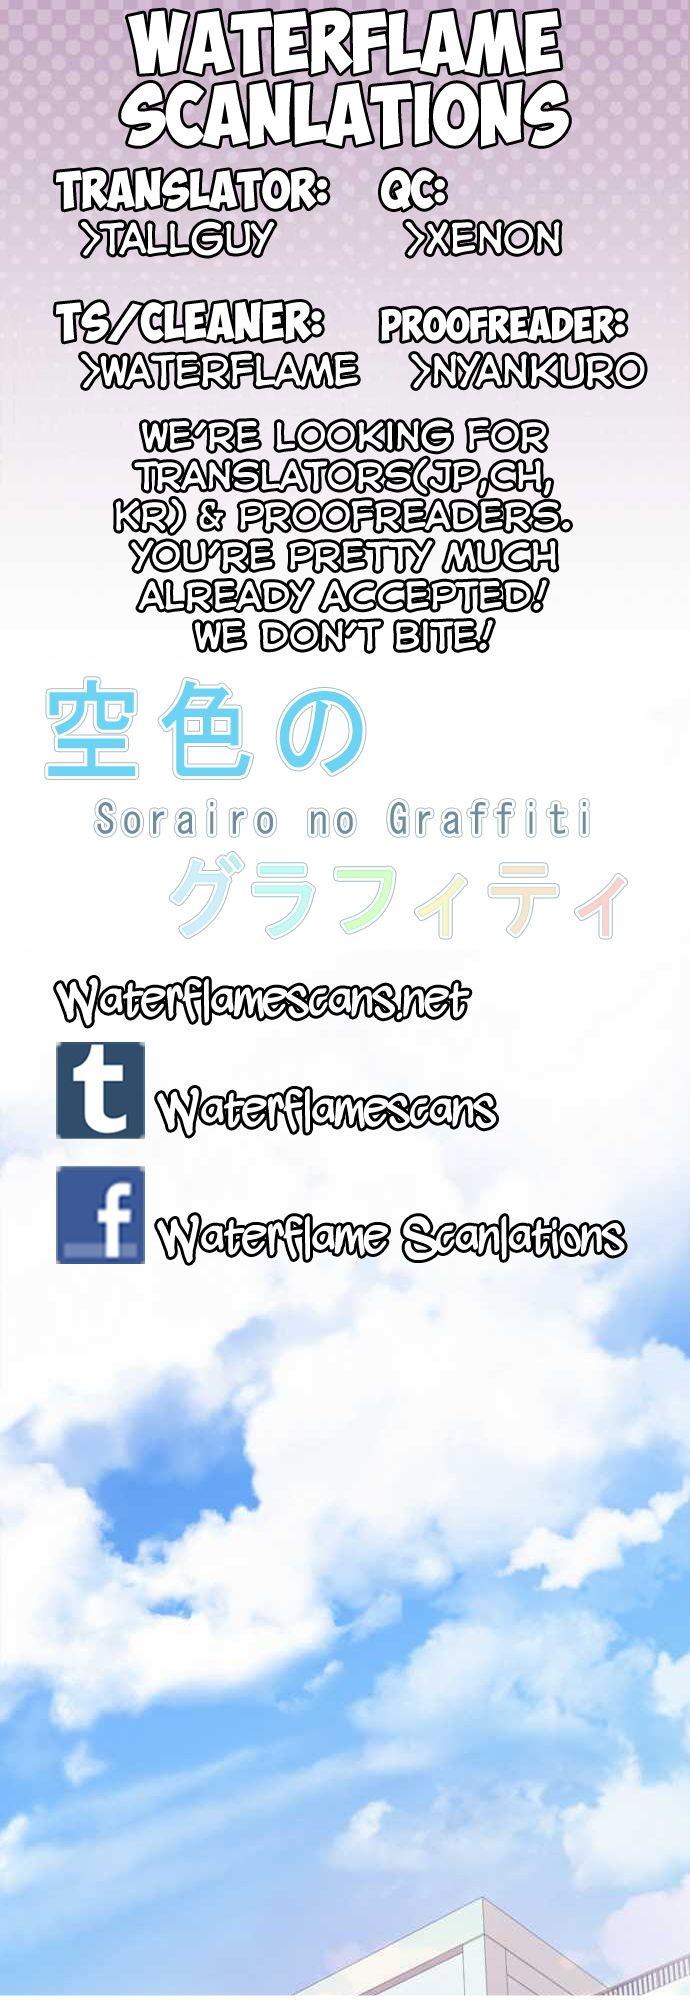 Sorairo no graffiti 14 read sorairo no graffiti chapter 14 online page 1